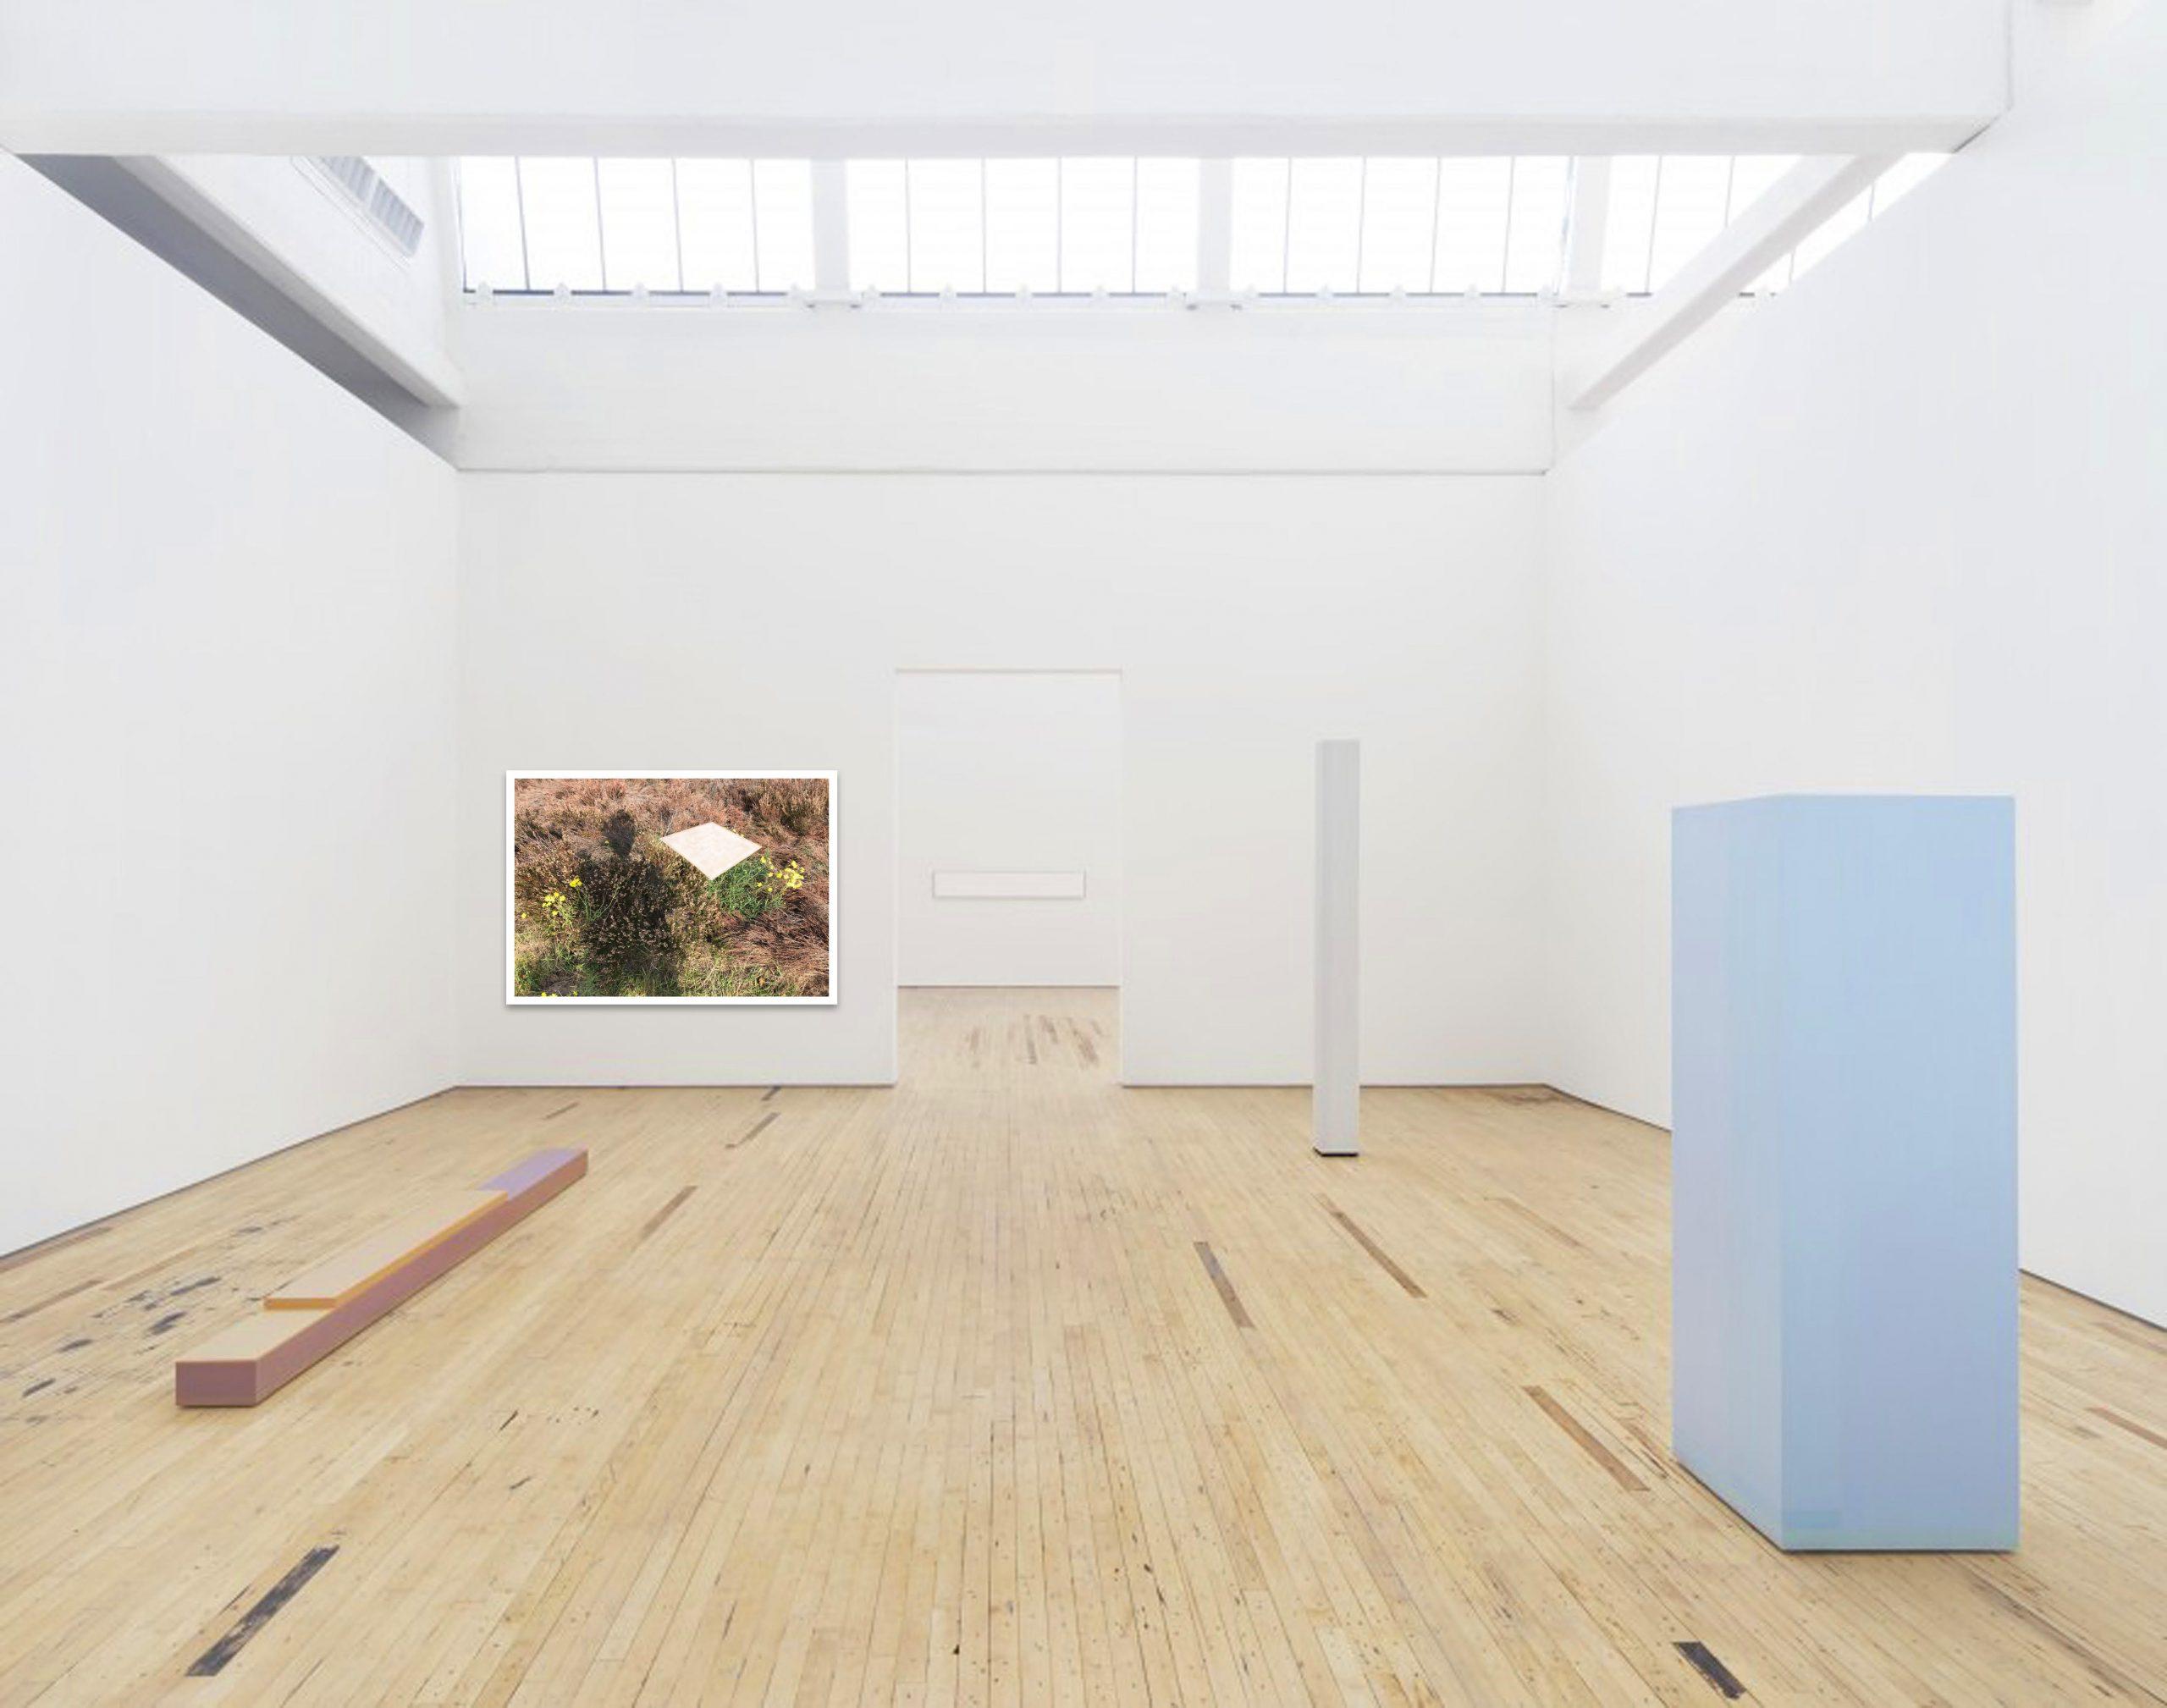 'A Minimal Life 7' samen met het werk van Anne Truitt in Dia Beacon, New York (VS)